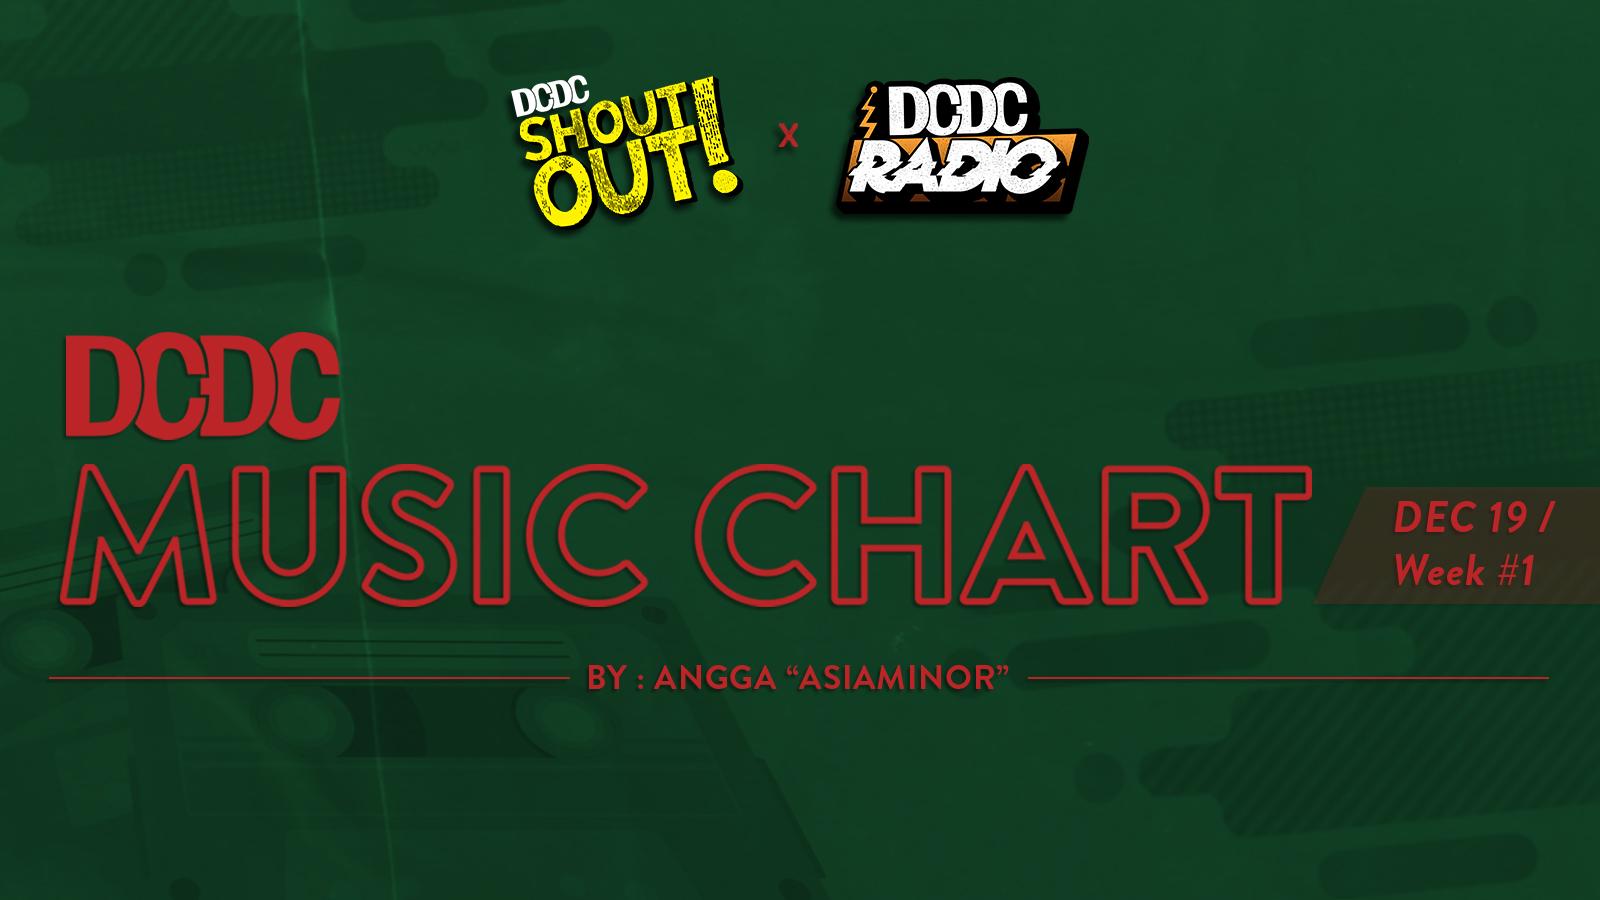 DCDC Music Chart - #1st Week of Desember 2019